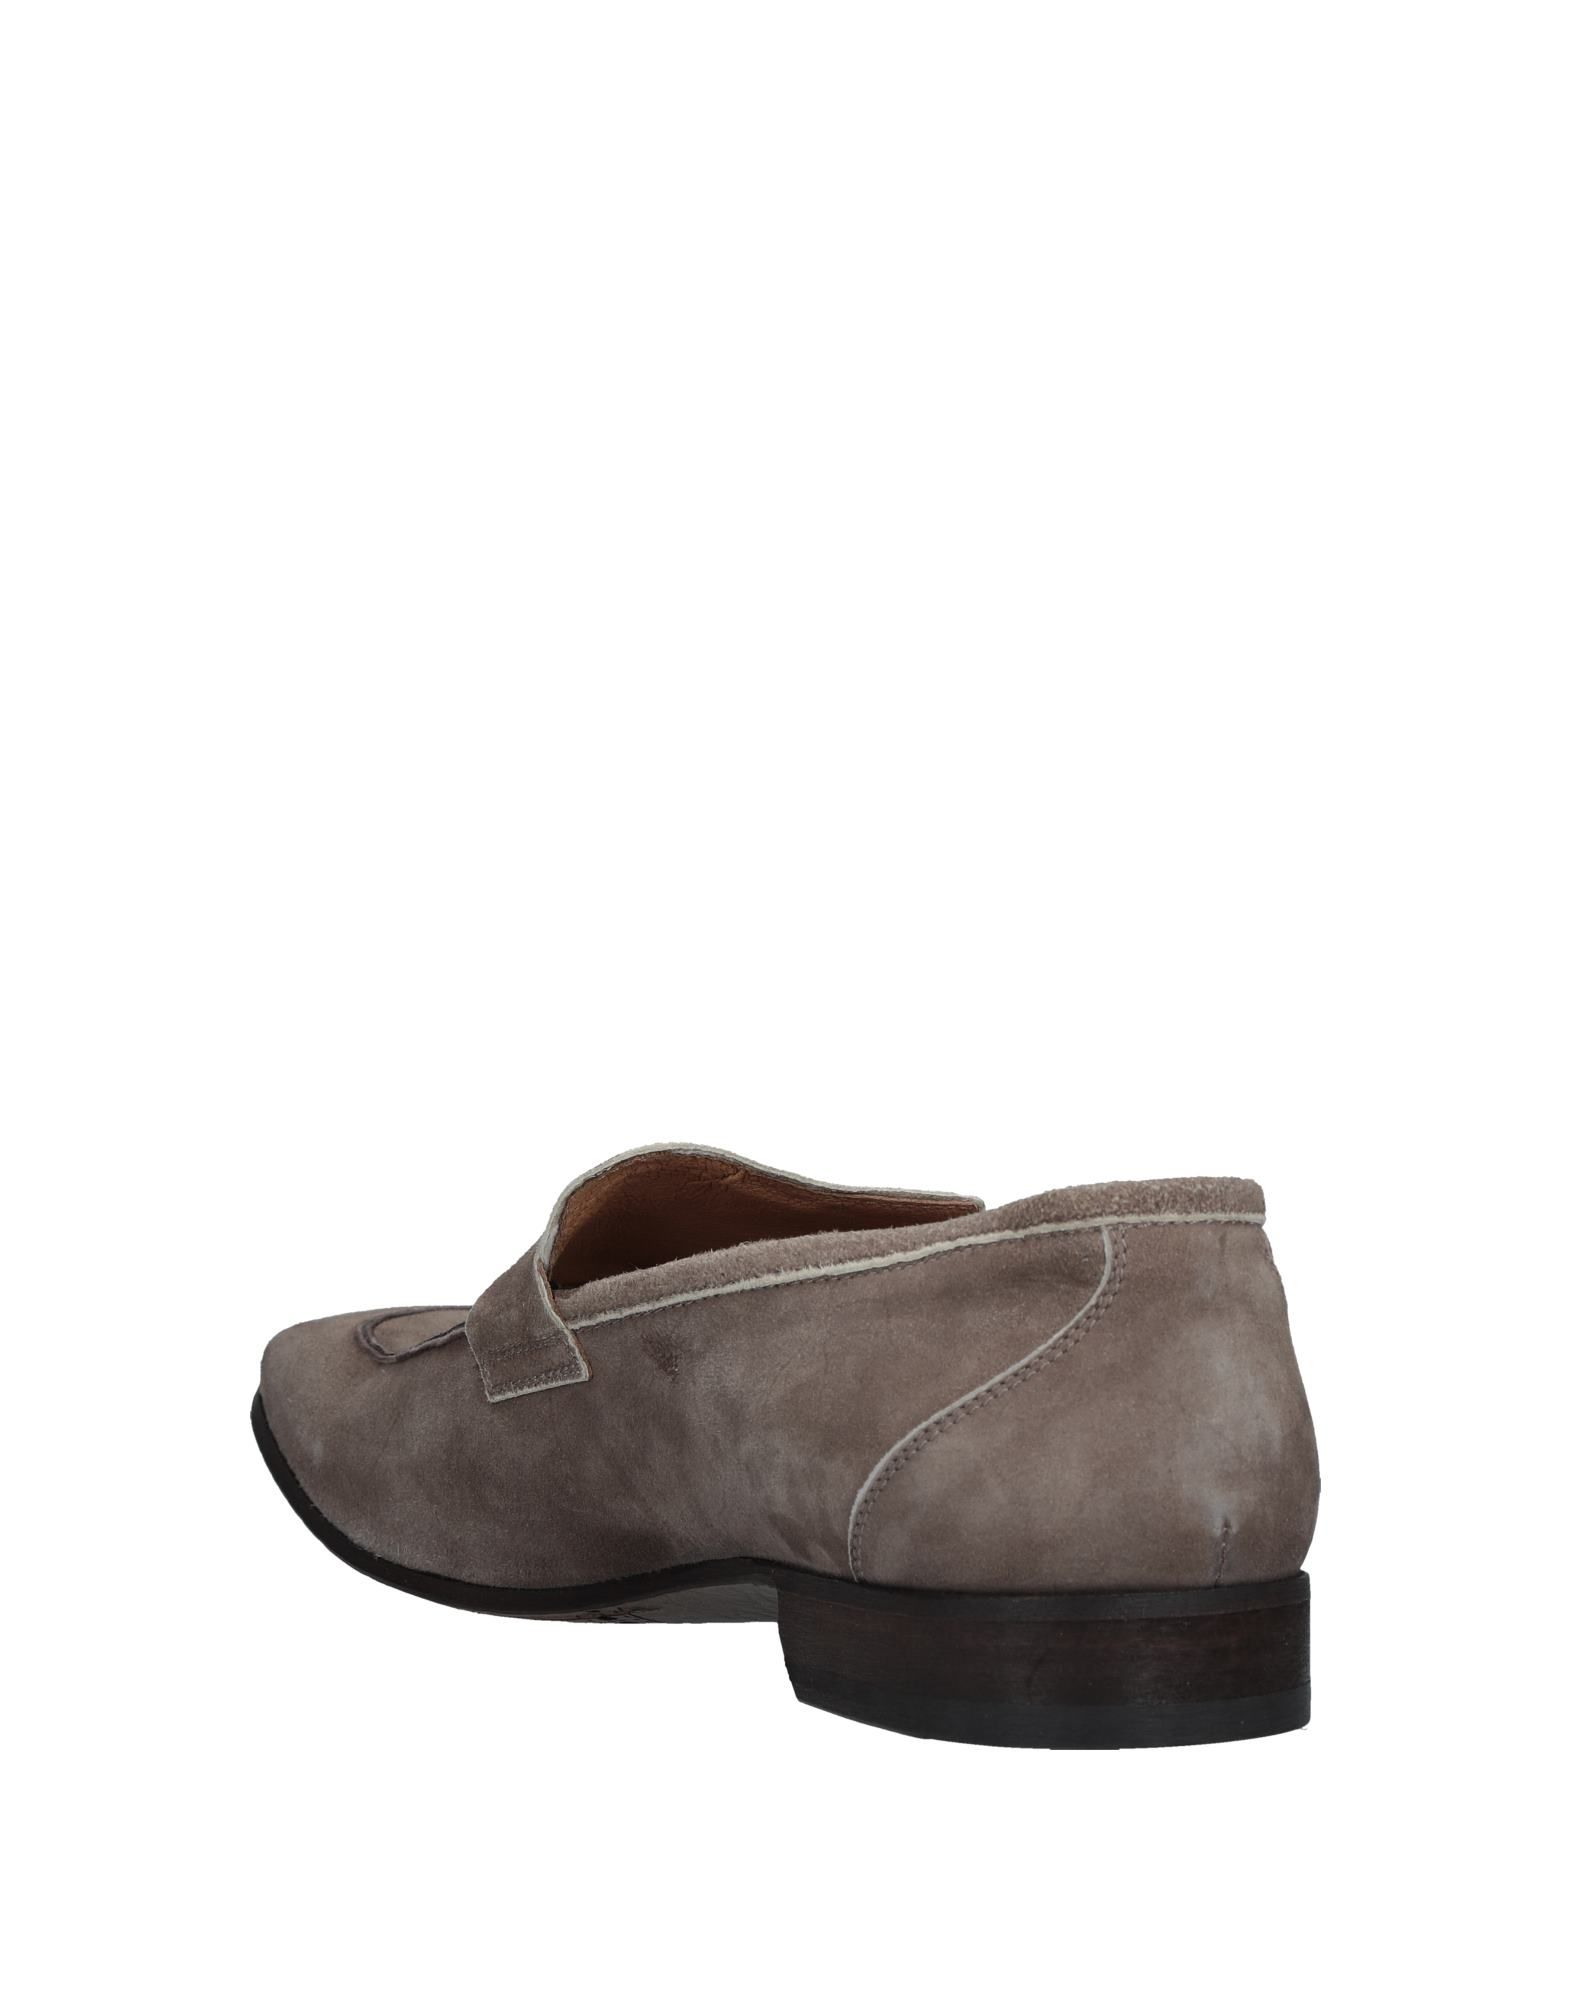 Rabatt echte Schuhe Herren Corvari Mokassins Herren Schuhe  11528300PR c4a1ee